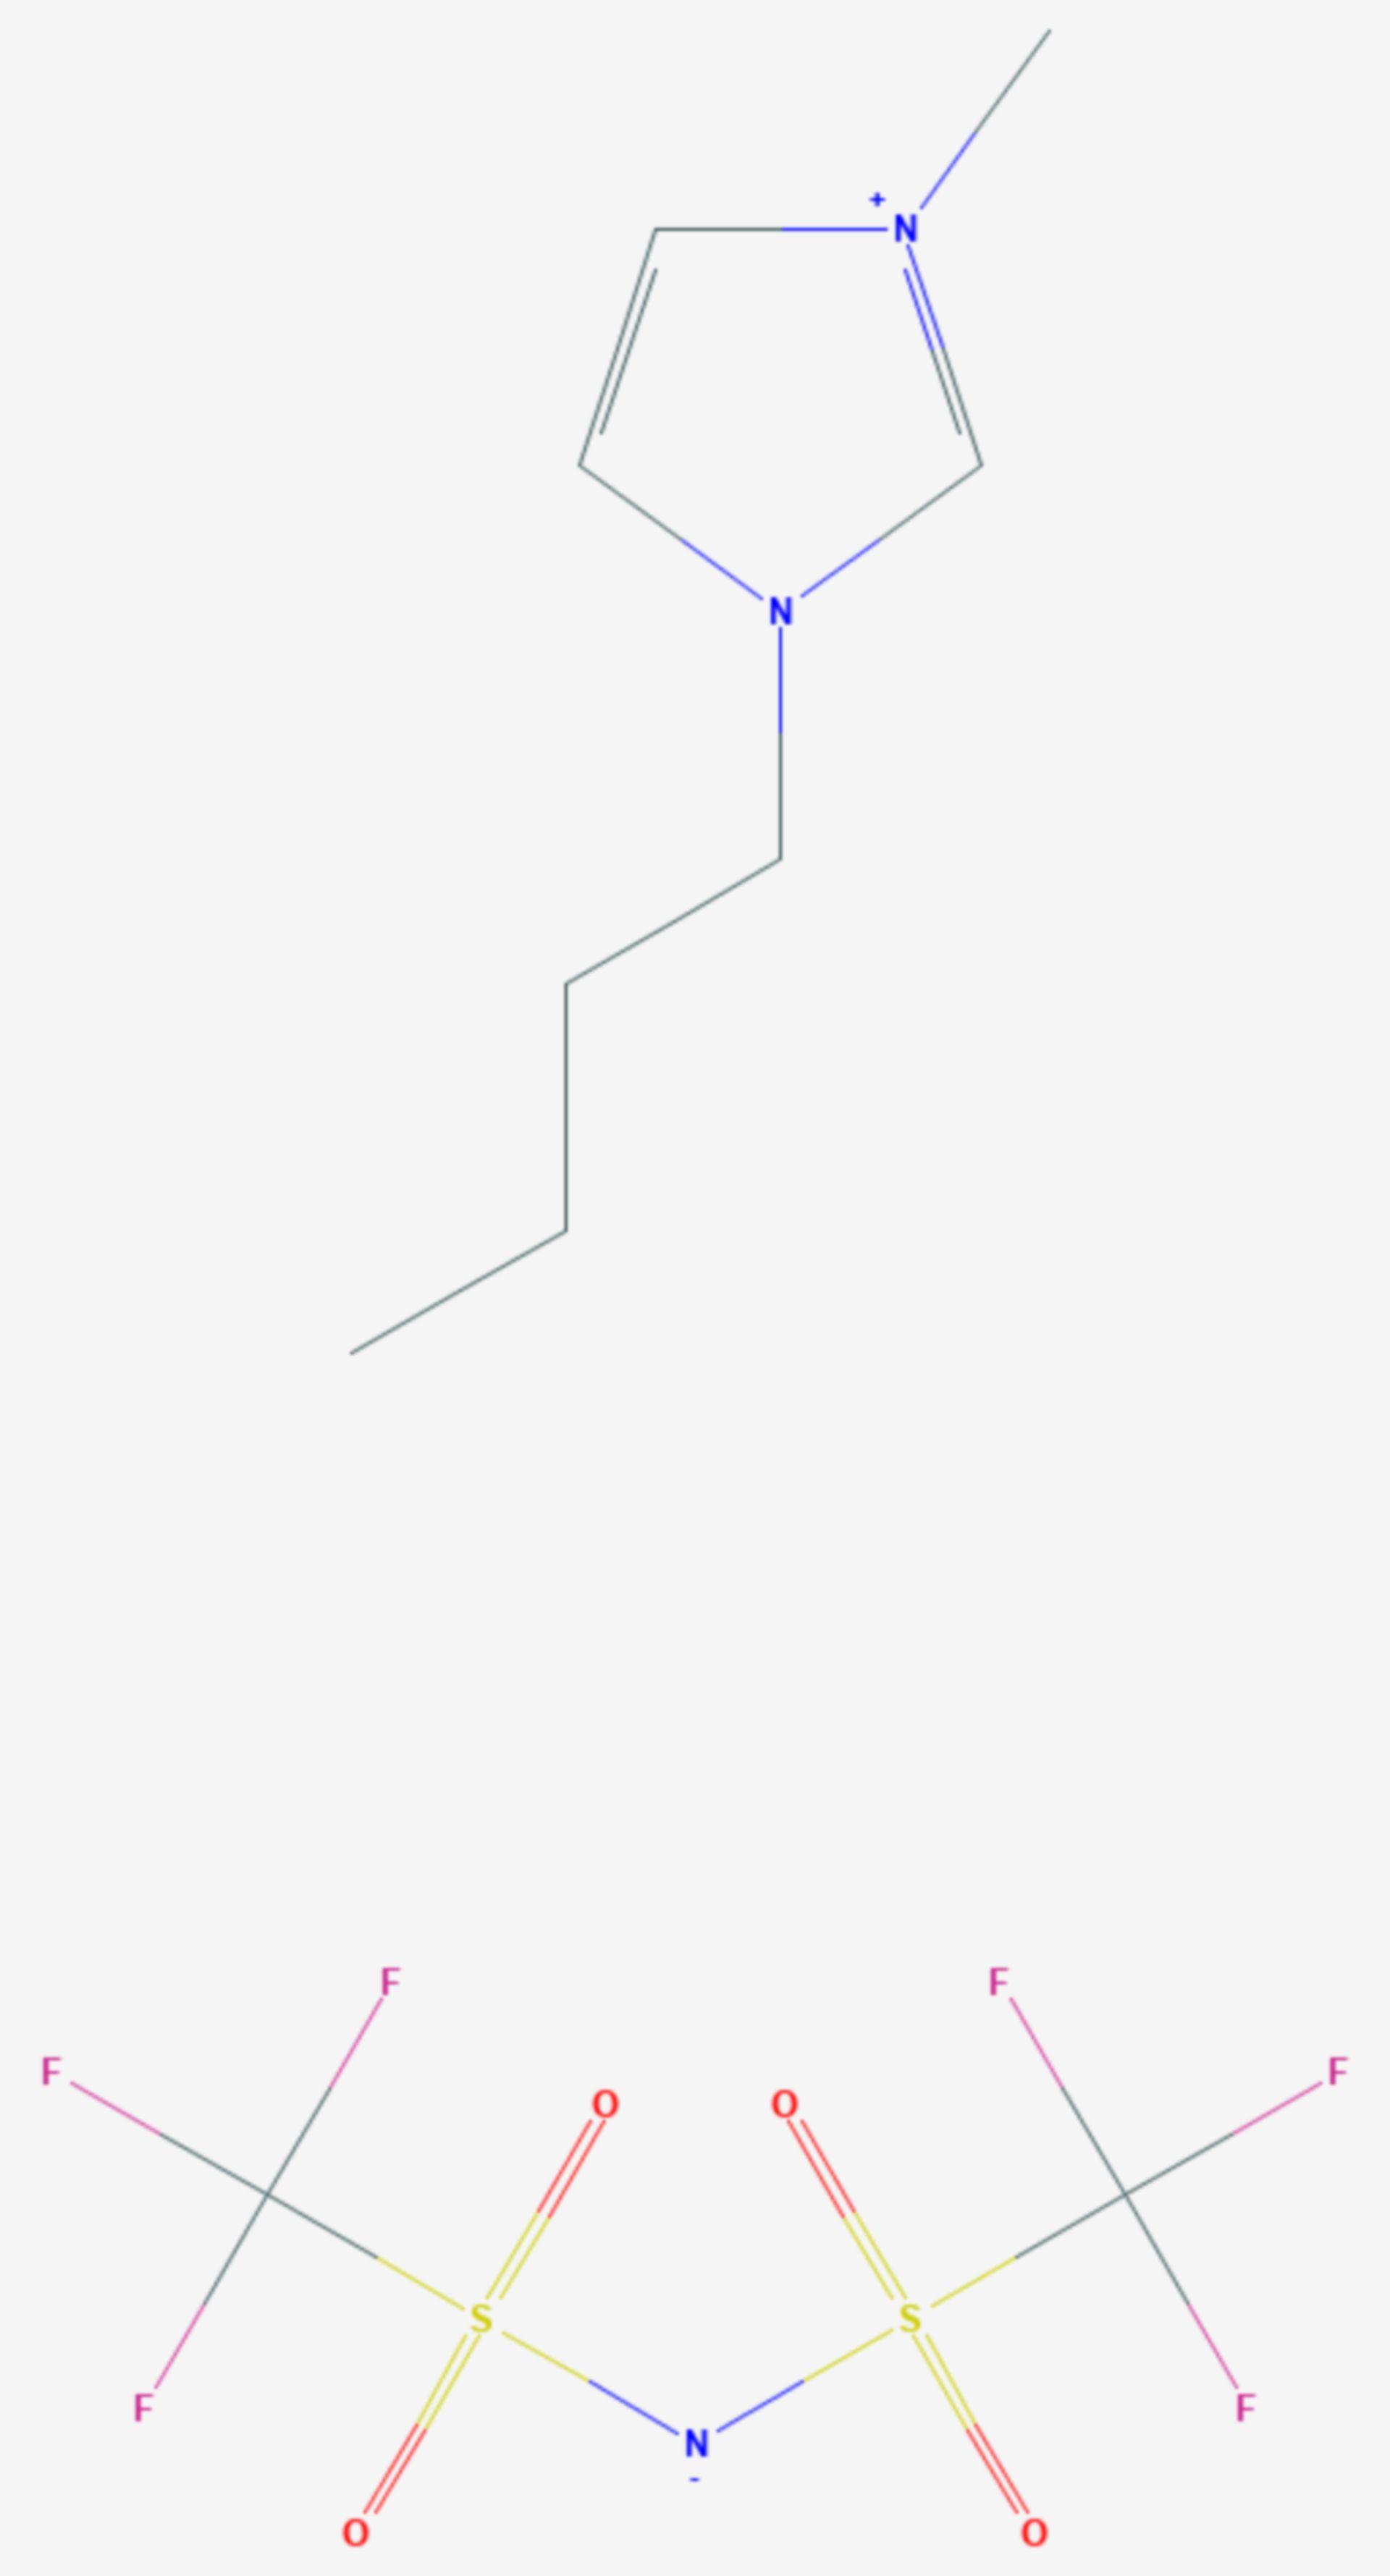 1-Butyl-3-methyl-imidazolium-bis(trifluormethylsulfonyl)-imid (Strukturformel)